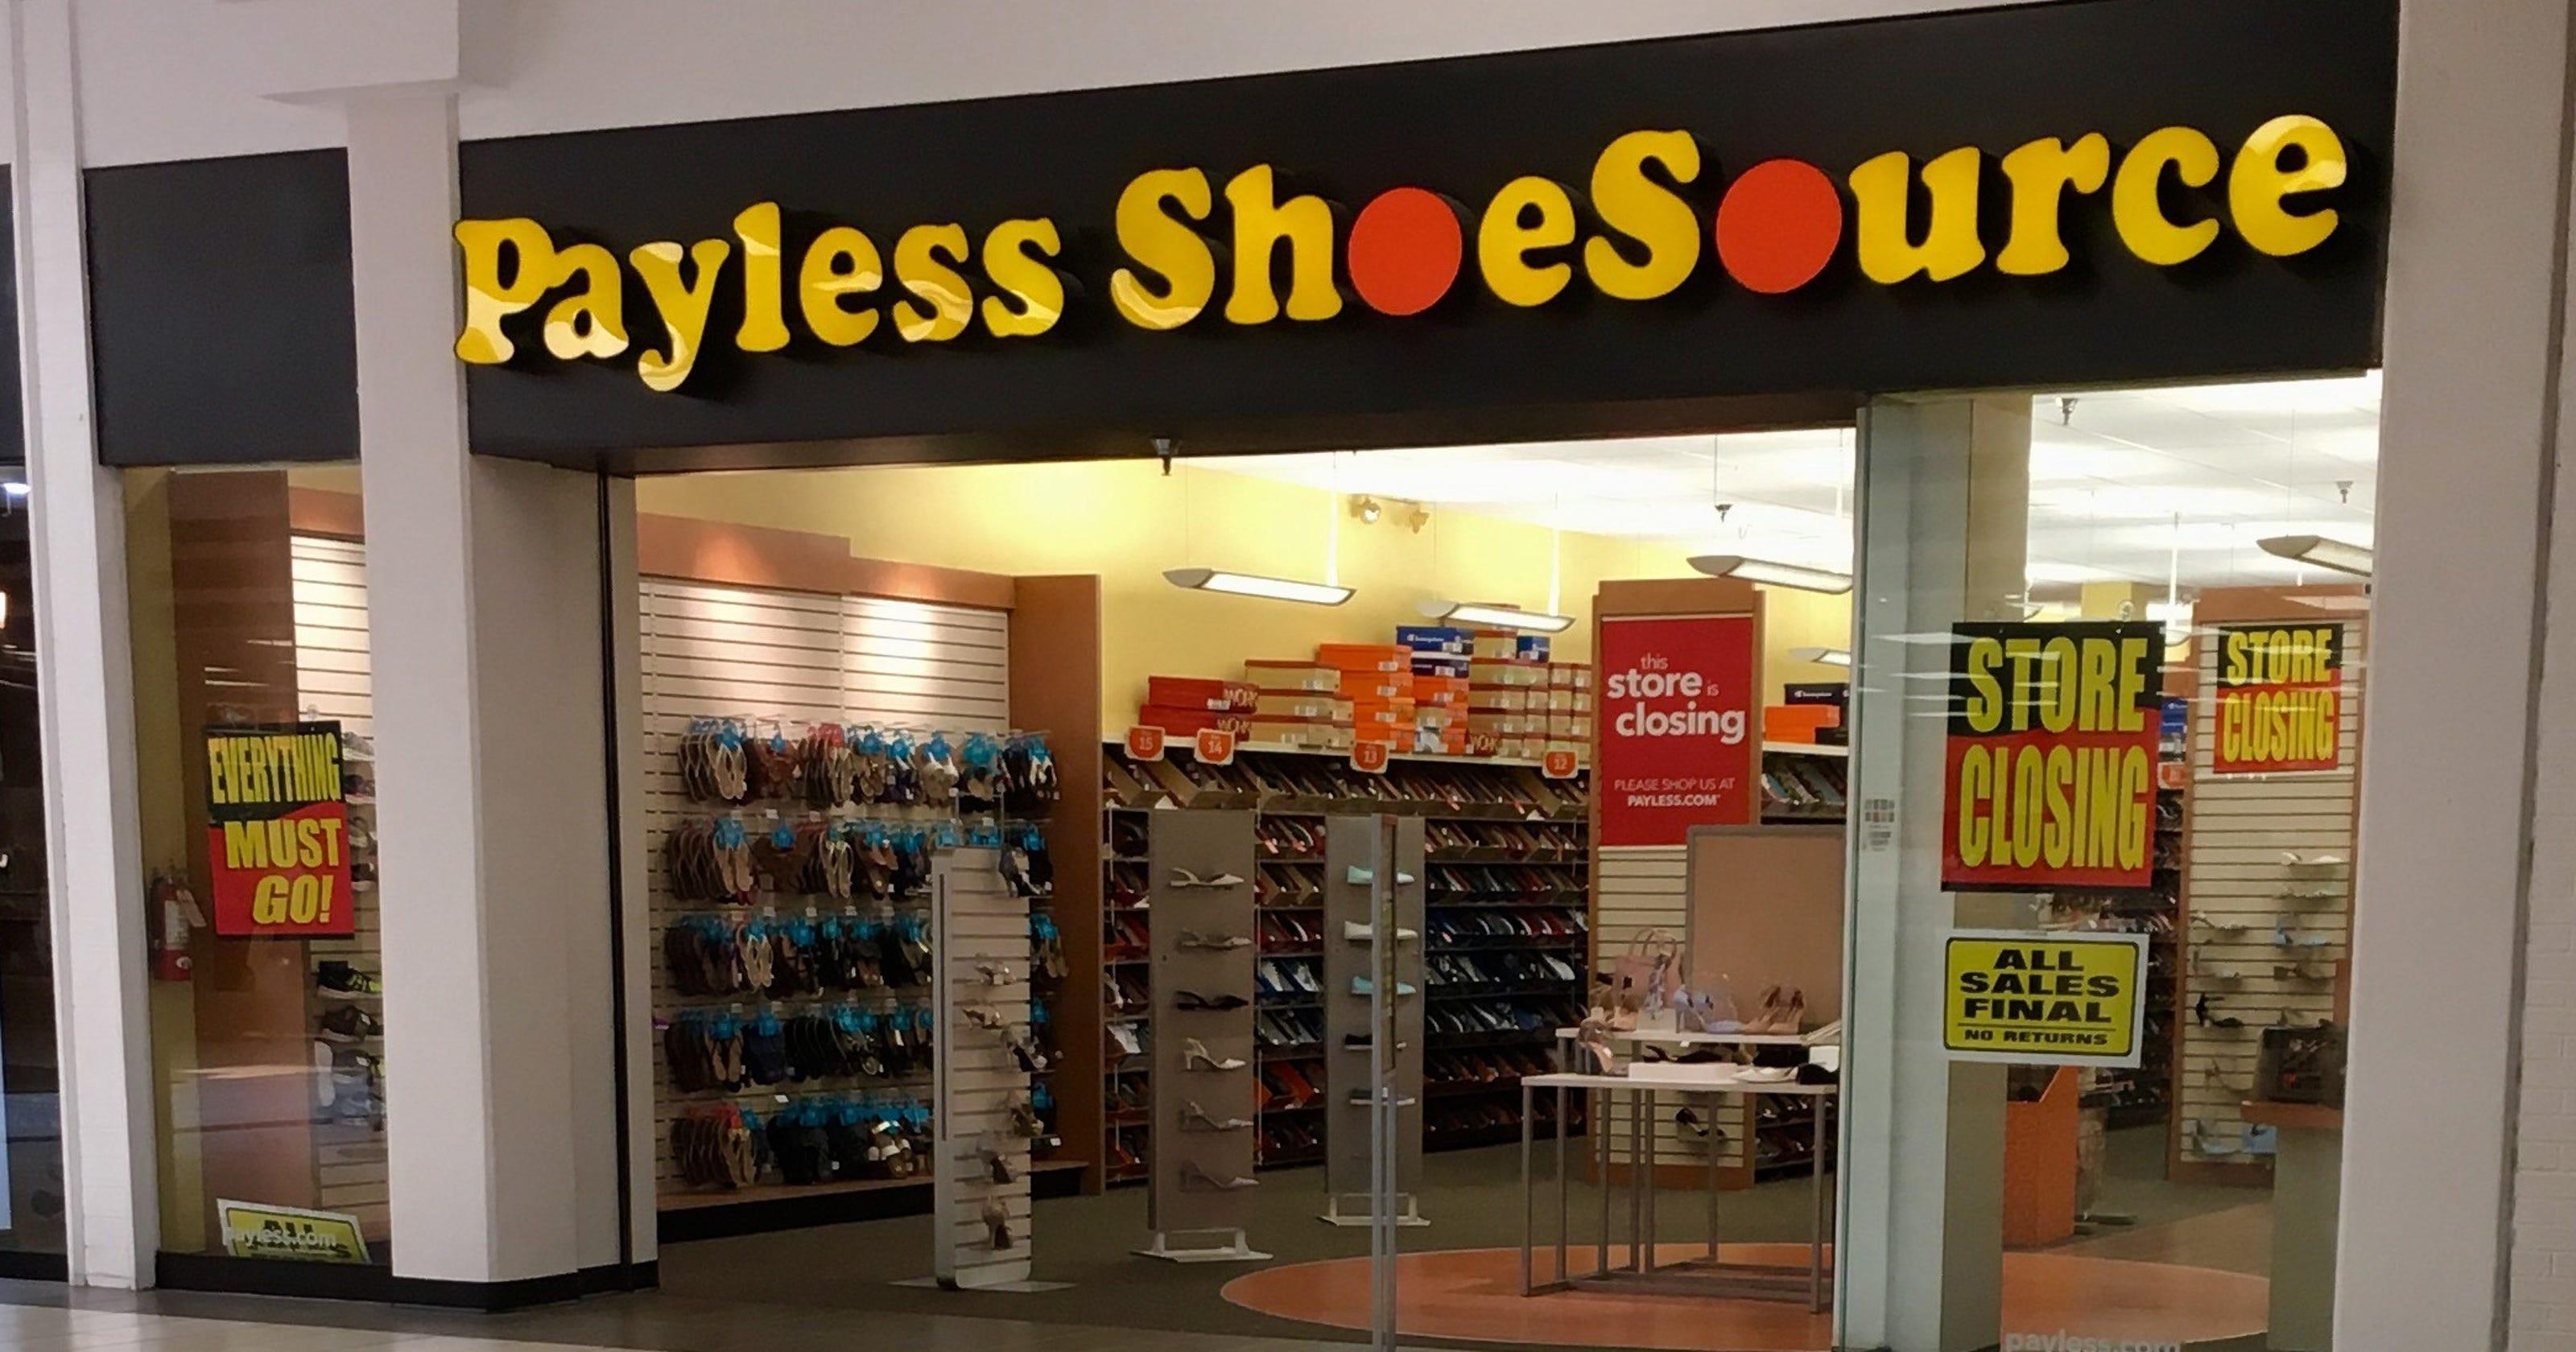 d62ca0896 Payless ShoeSource closing Wichita Falls store